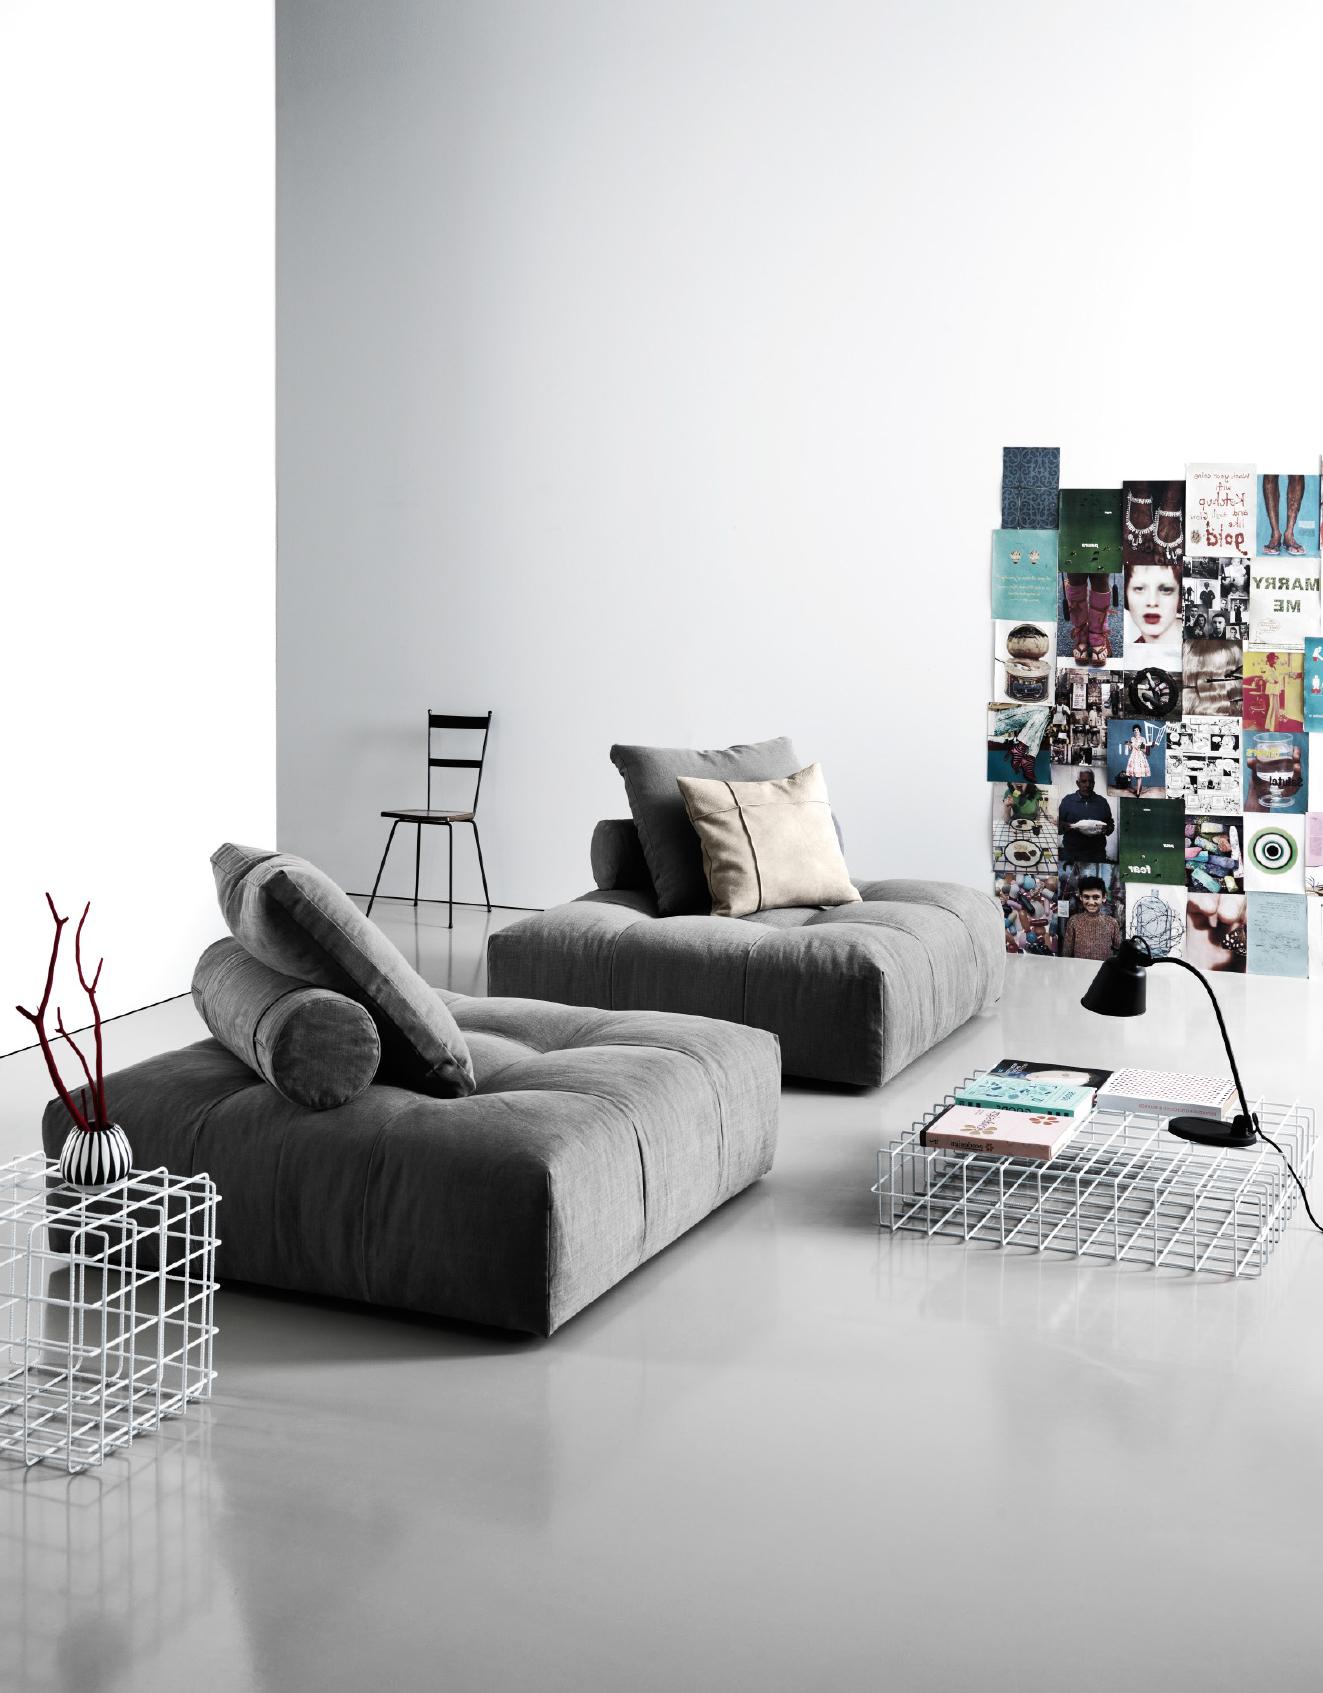 Pixel divani saba ginocchi arredamenti for Divani saba prezzi